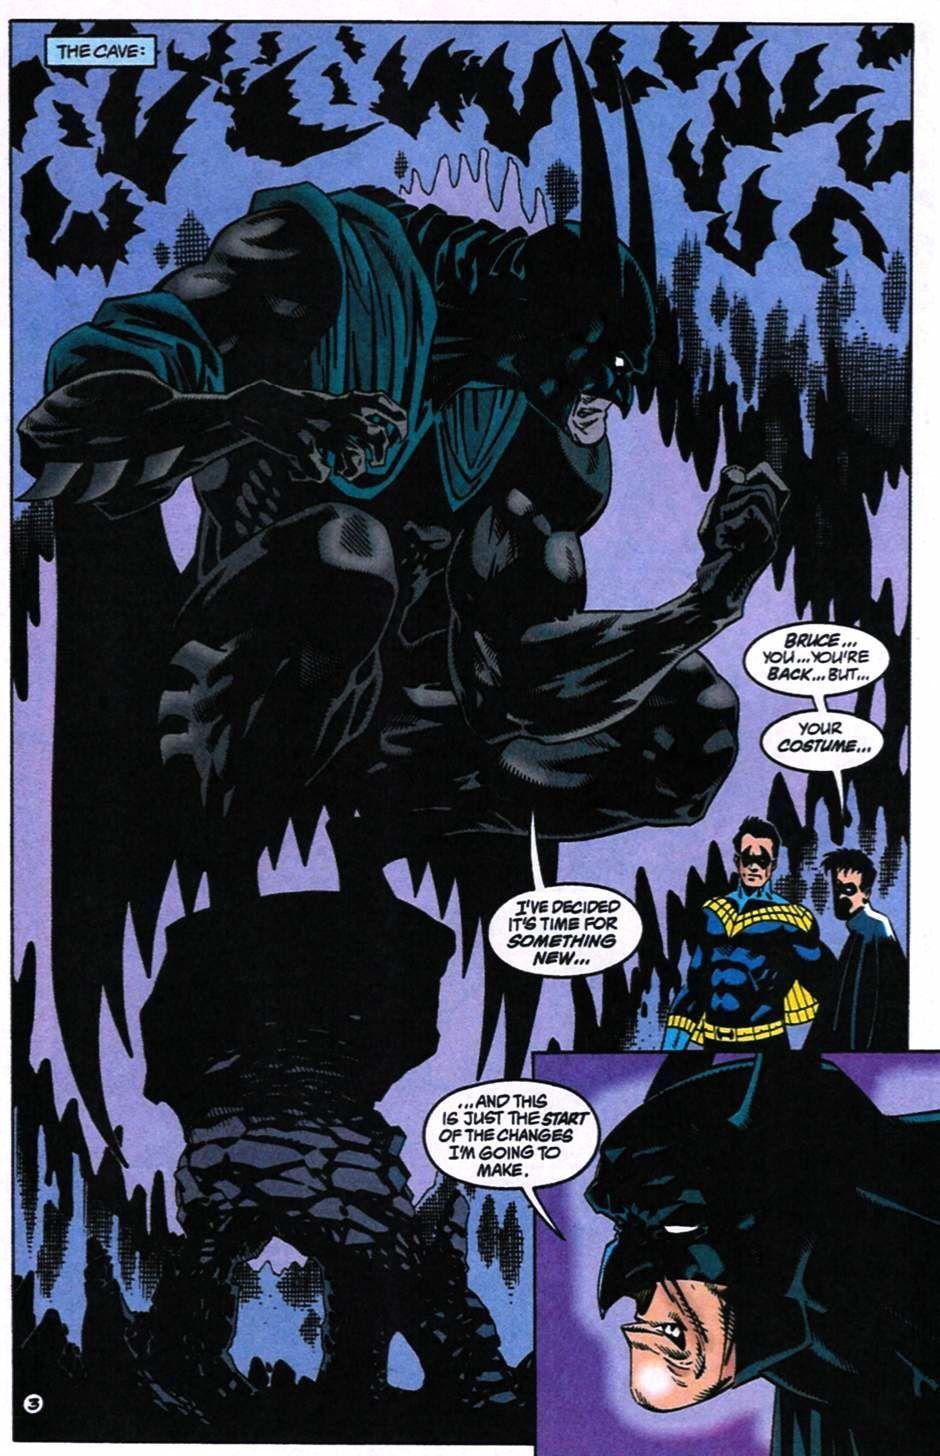 Batman 515 #1 (Writer: Doug Moench, Artists: Kelley Jones, John Beatty)